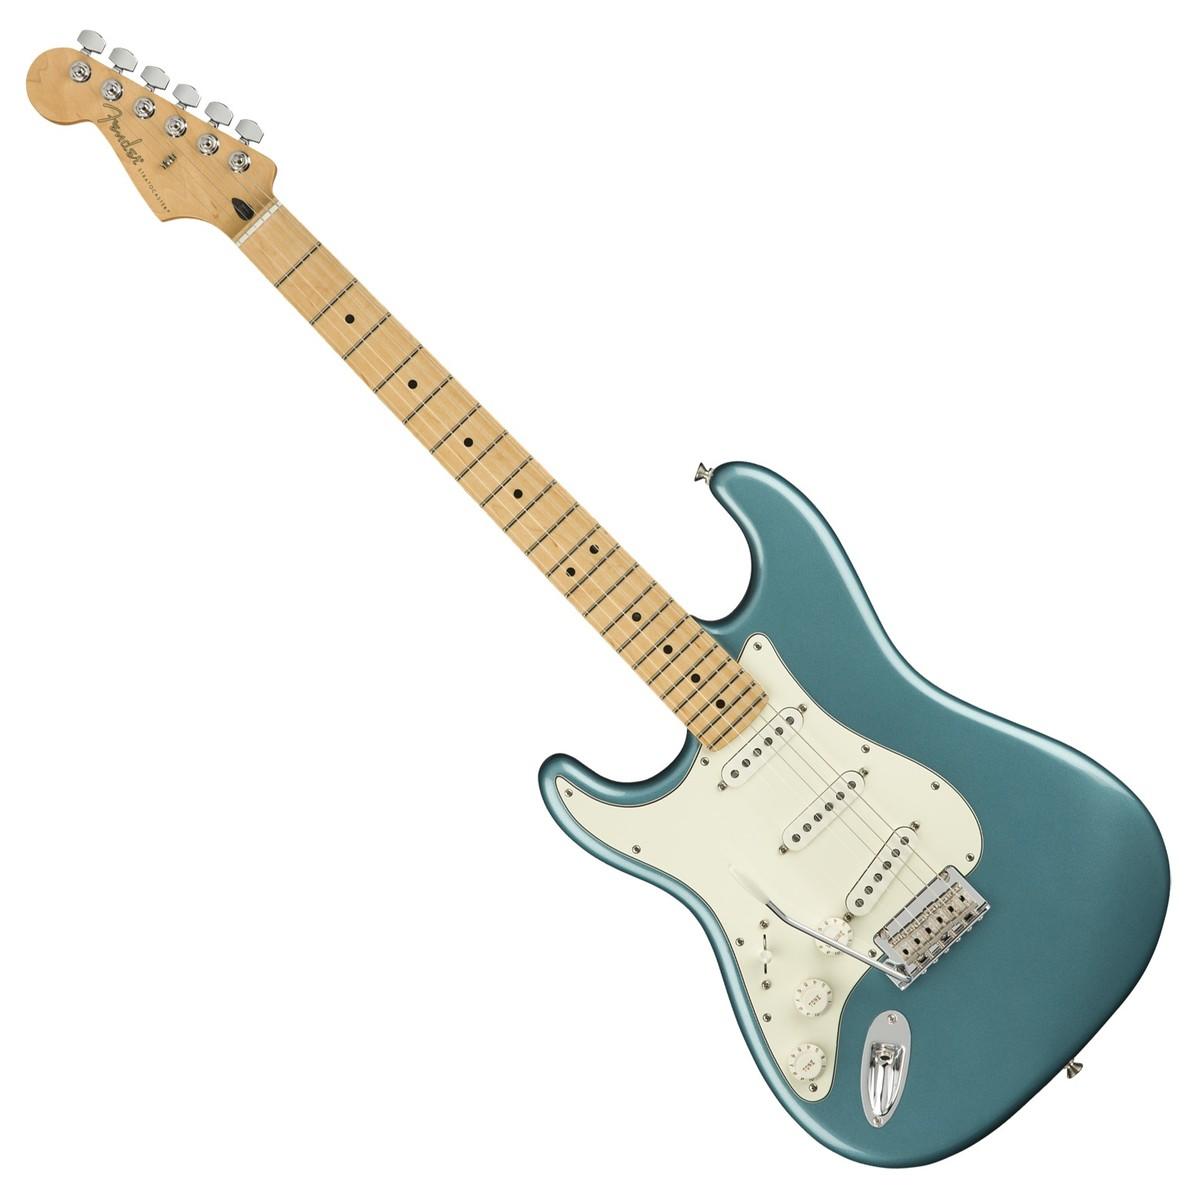 fender player stratocaster mn left handed tidepool at gear4music. Black Bedroom Furniture Sets. Home Design Ideas